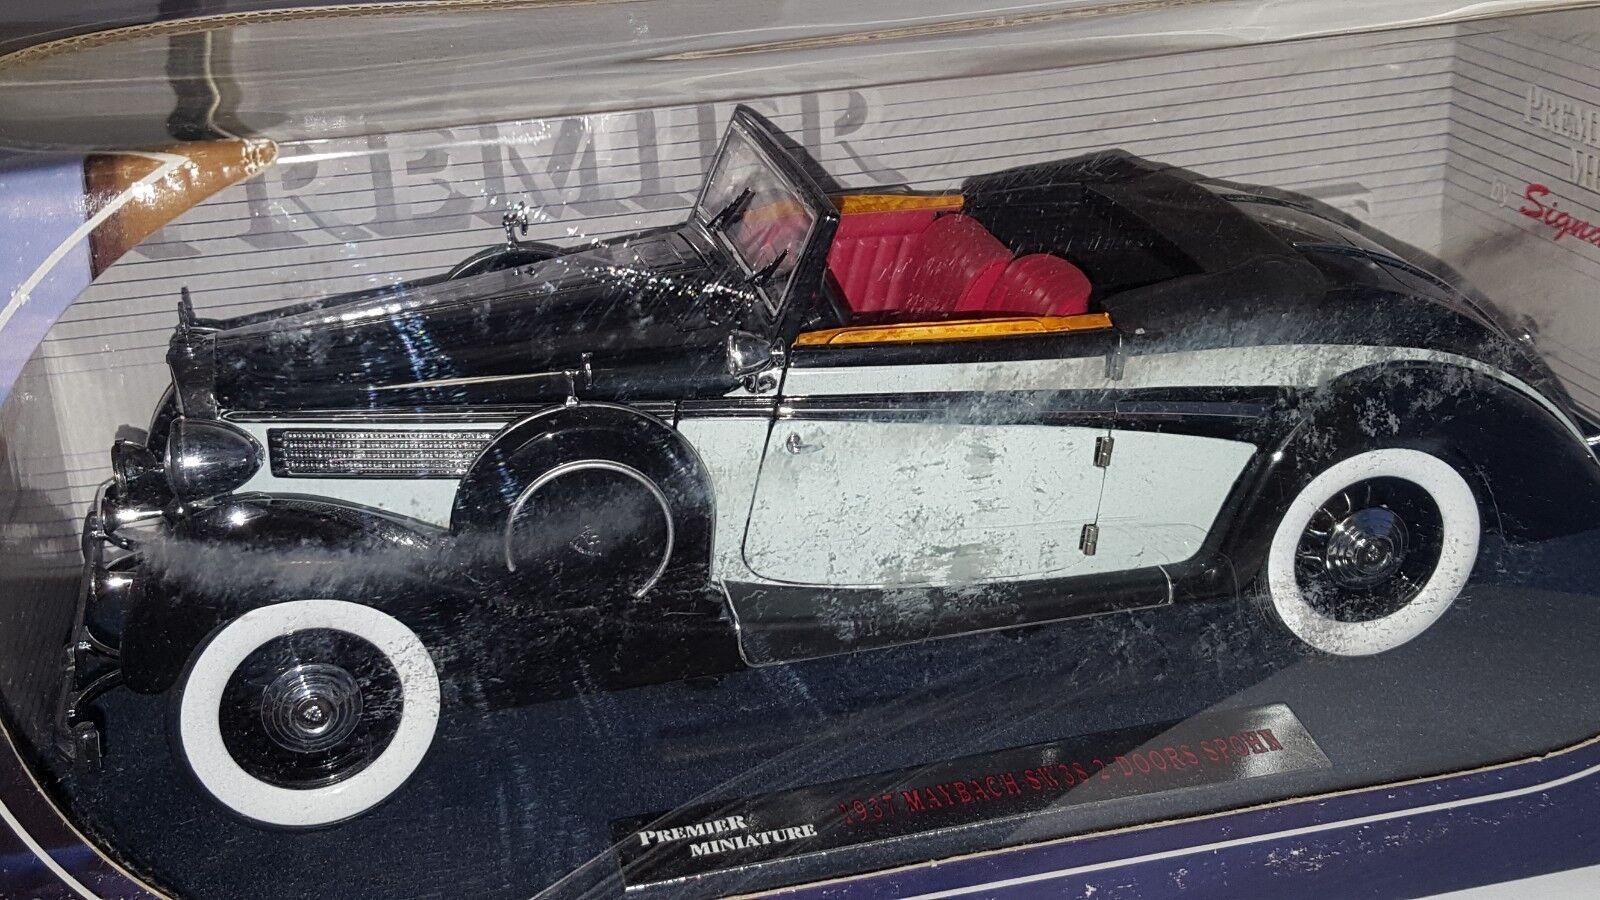 1 18 modelos de firma Premier Miniatura 1937 Maybach SW382 2 puertas Spohn RD